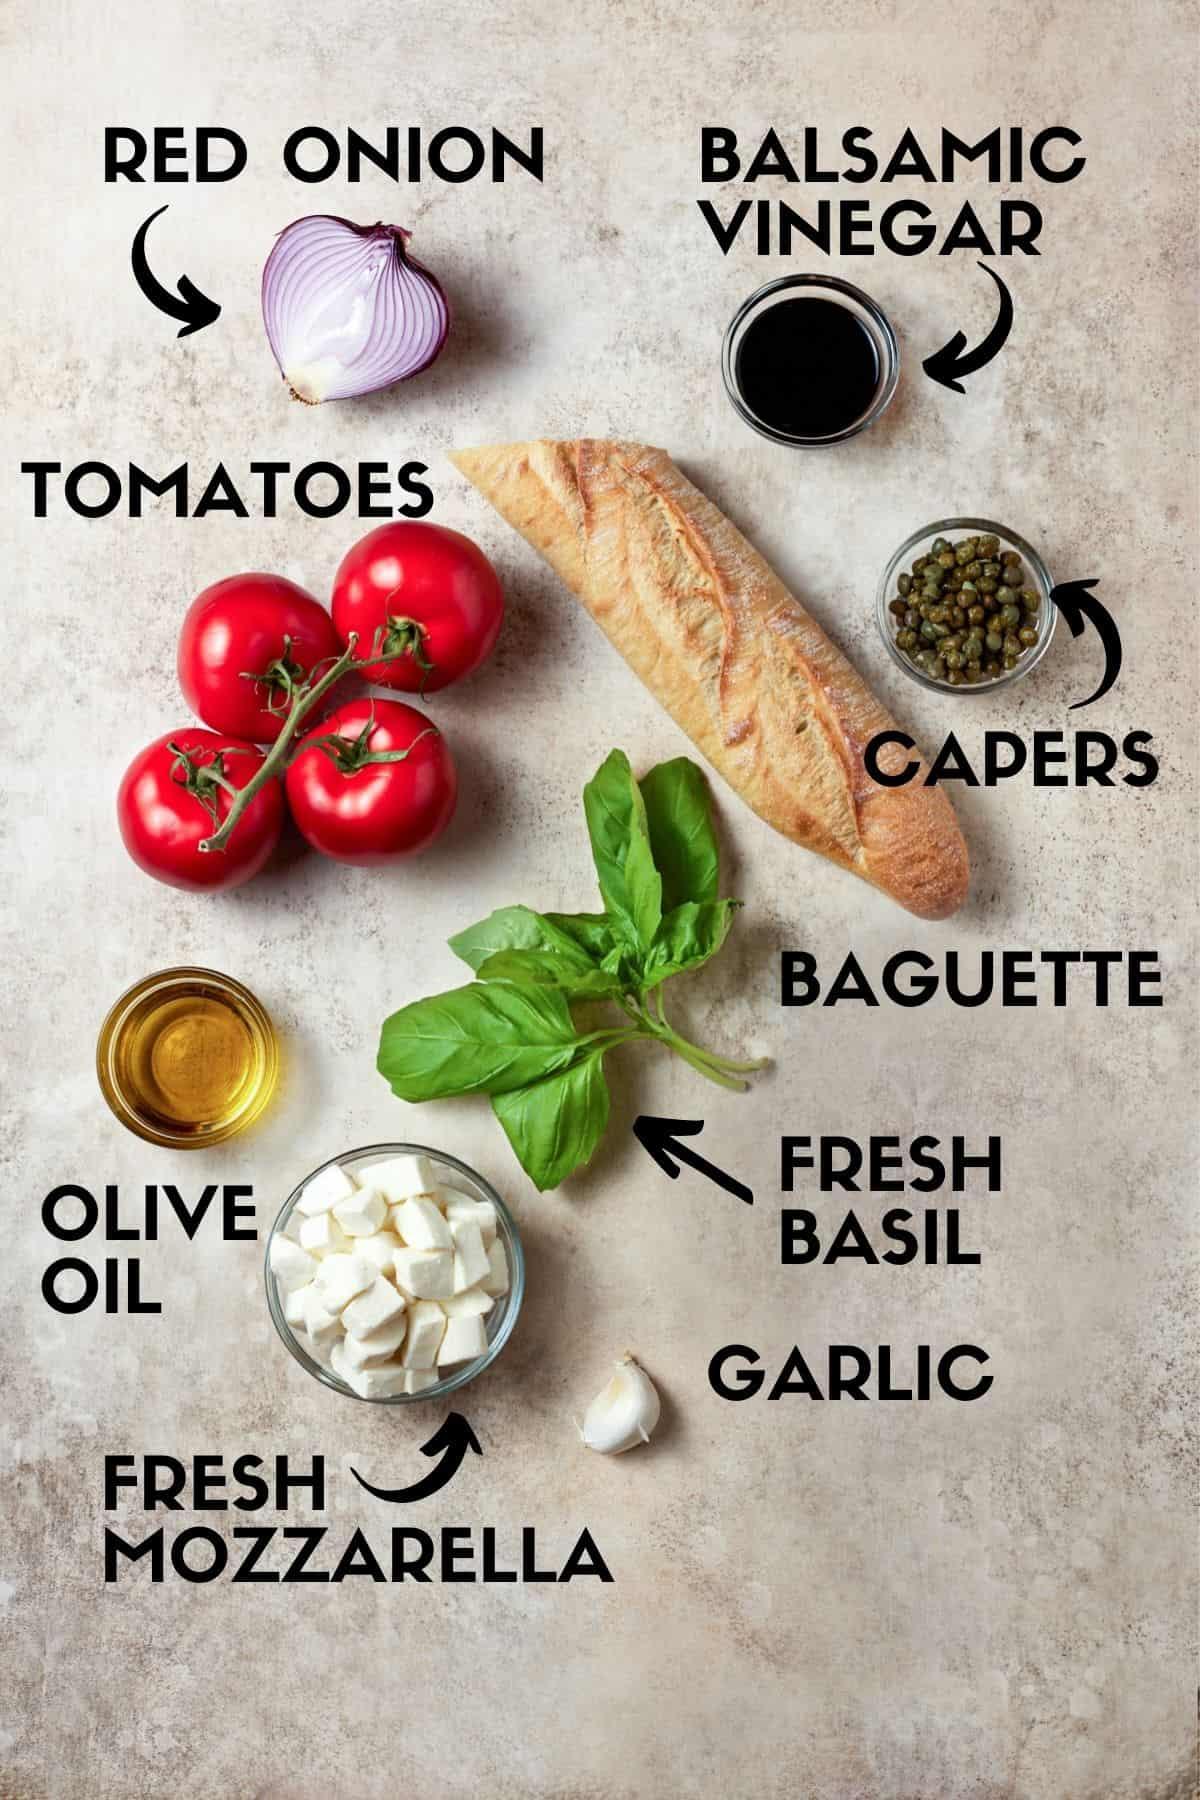 Panzanella salad ingredients including tomatoes, mozzarella cheese, bread and fresh basil.